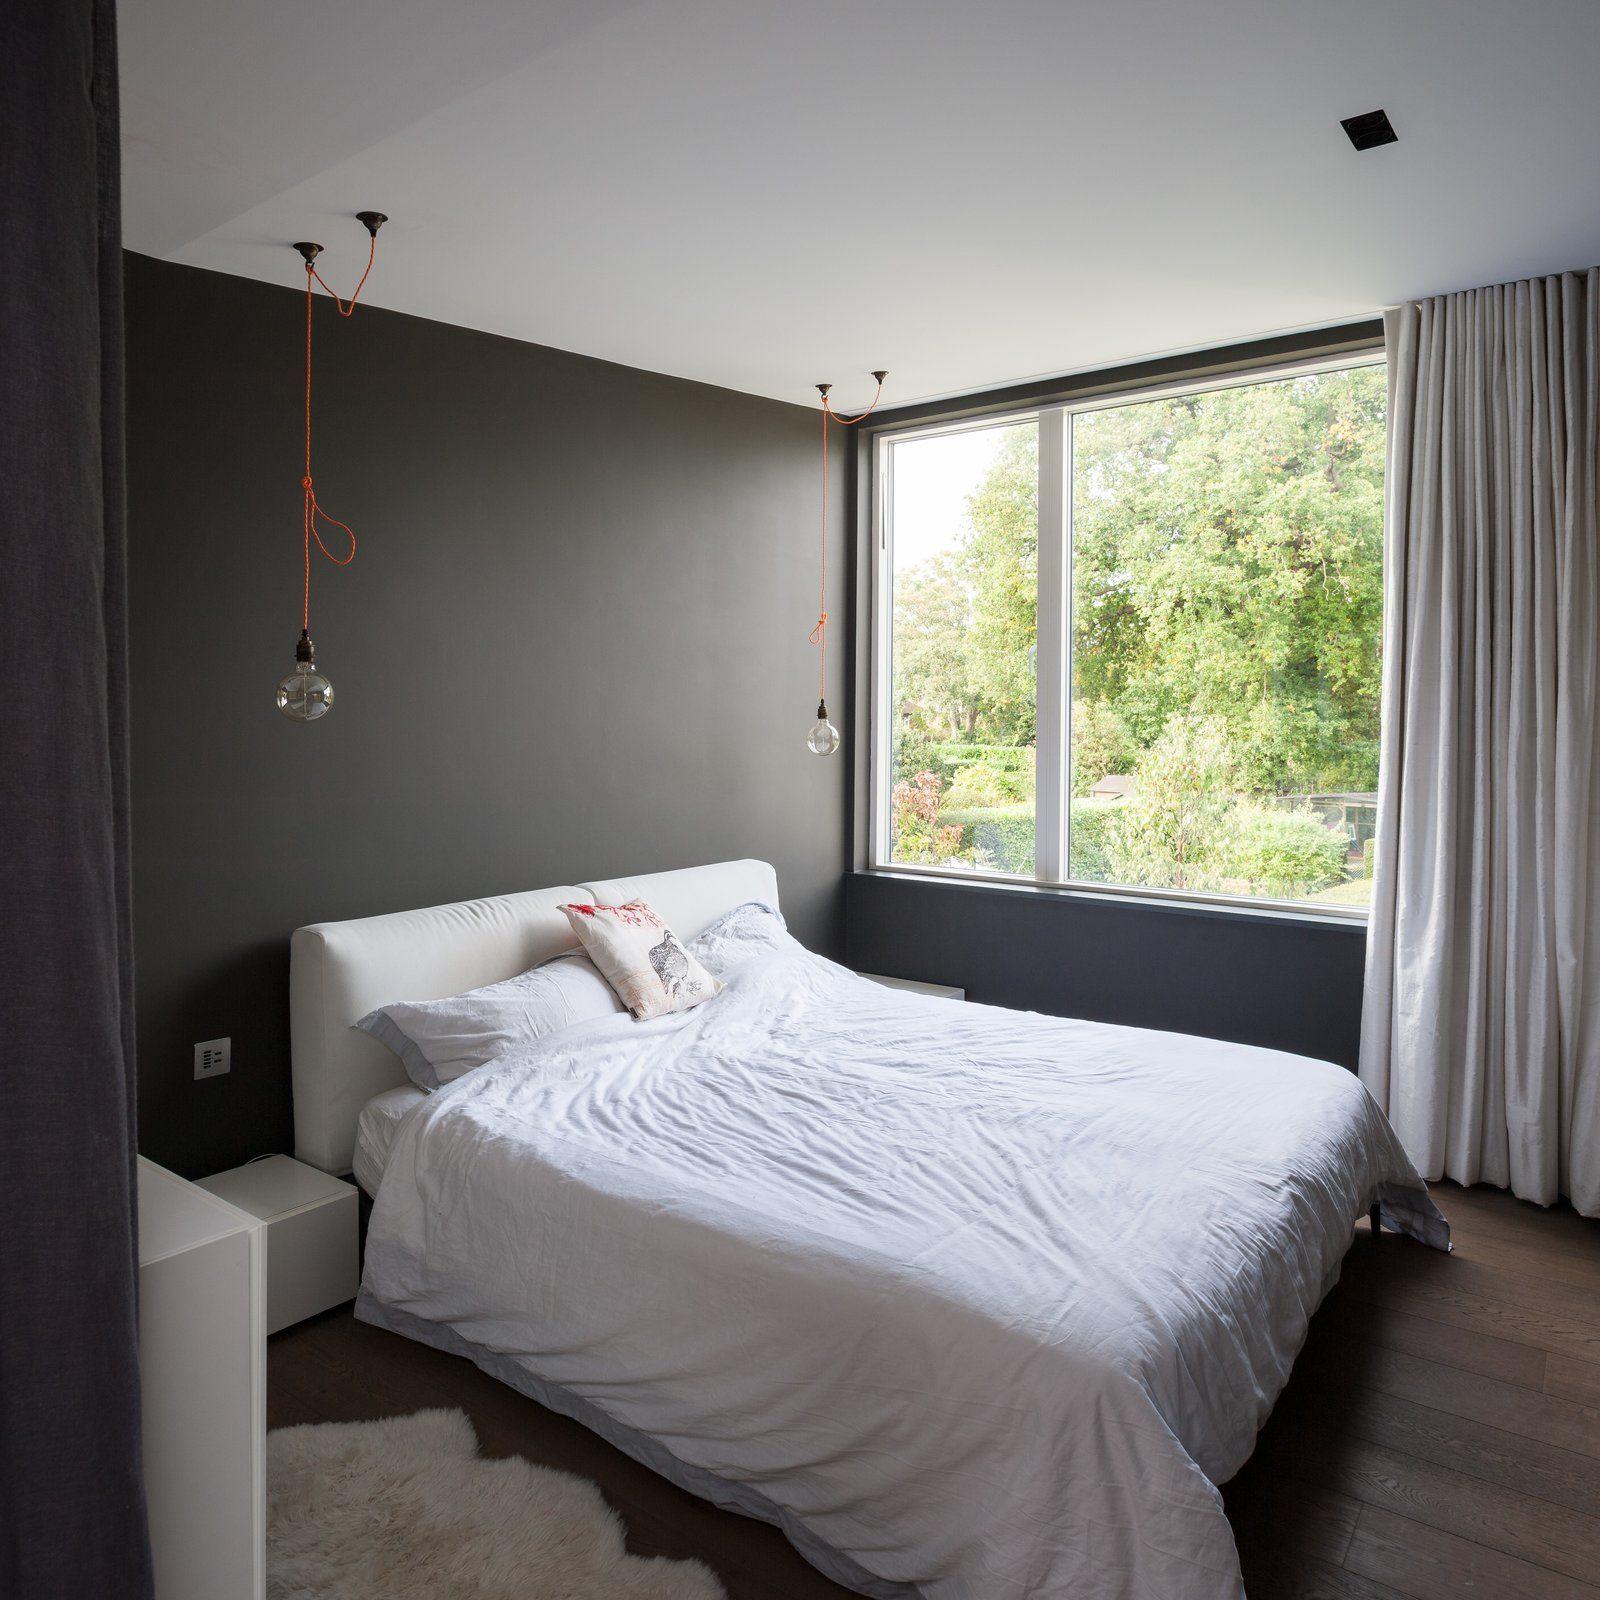 50 Bright Ideas For Bedroom Ceiling Lighting Bedroom Ceiling Light Master Bedroom Lighting Bedroom Lighting